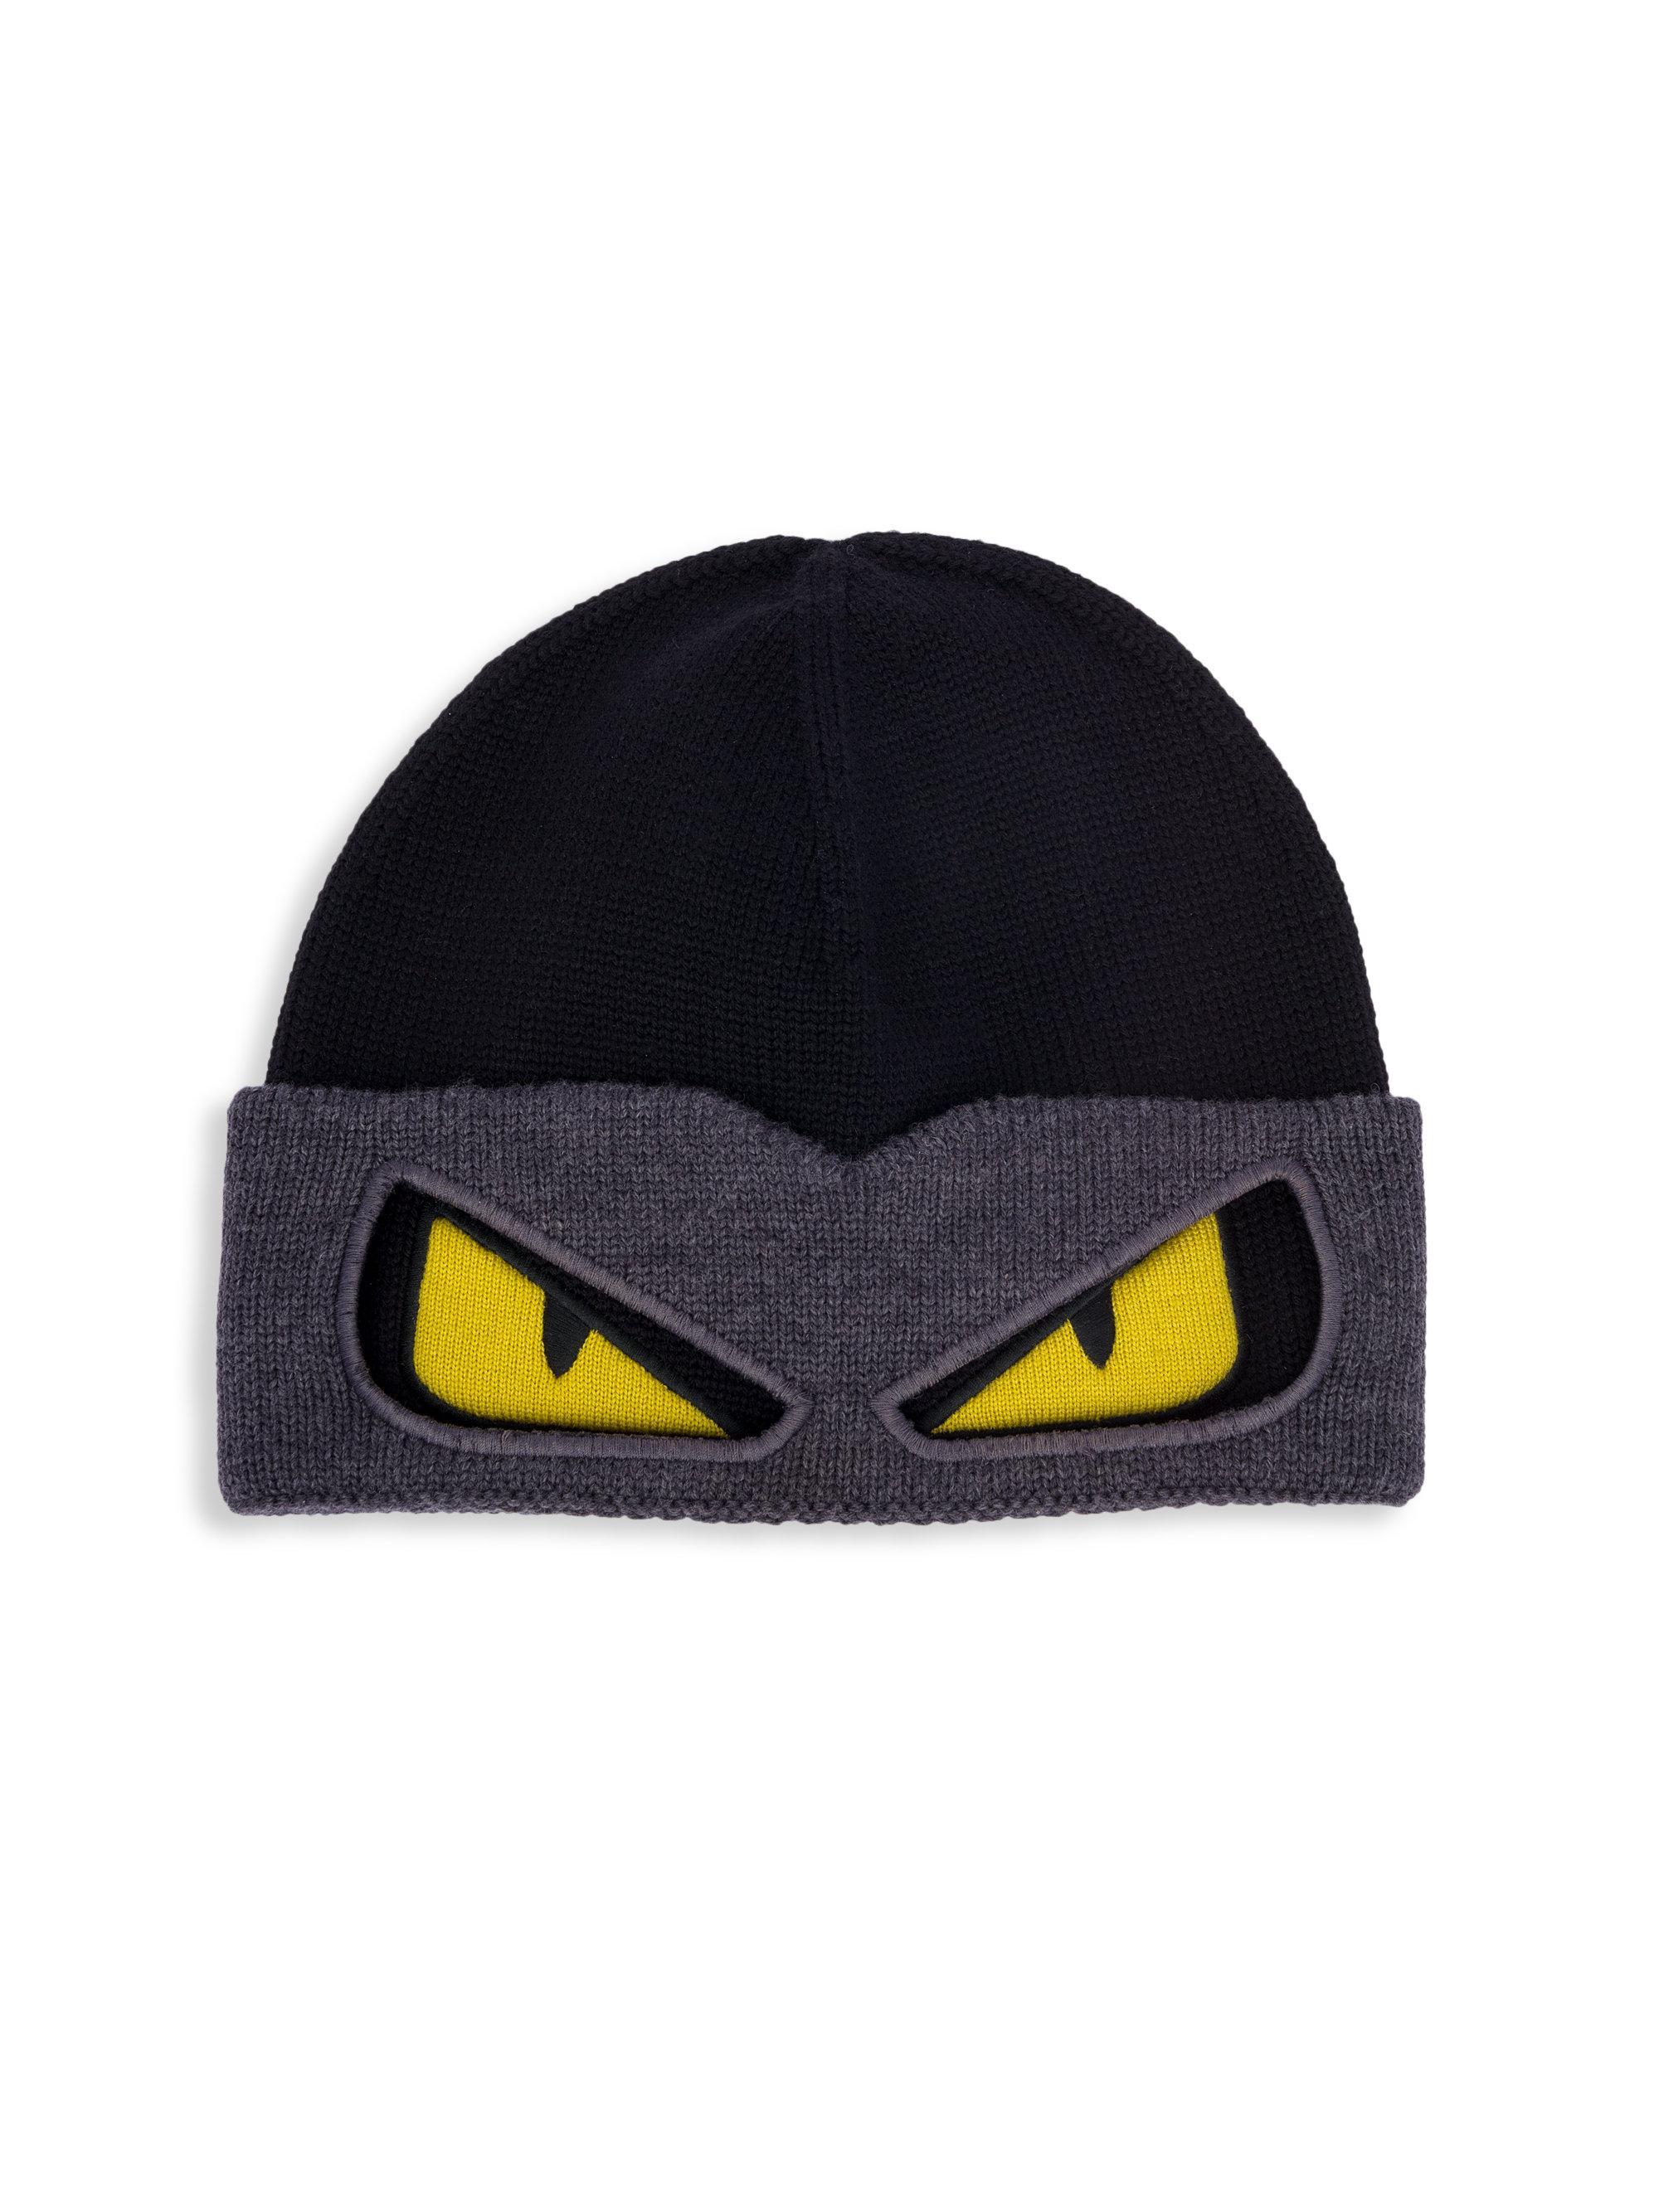 Lyst - Fendi Bag Bugs Convertible Wool Ski Hat in Black for Men a7905237624